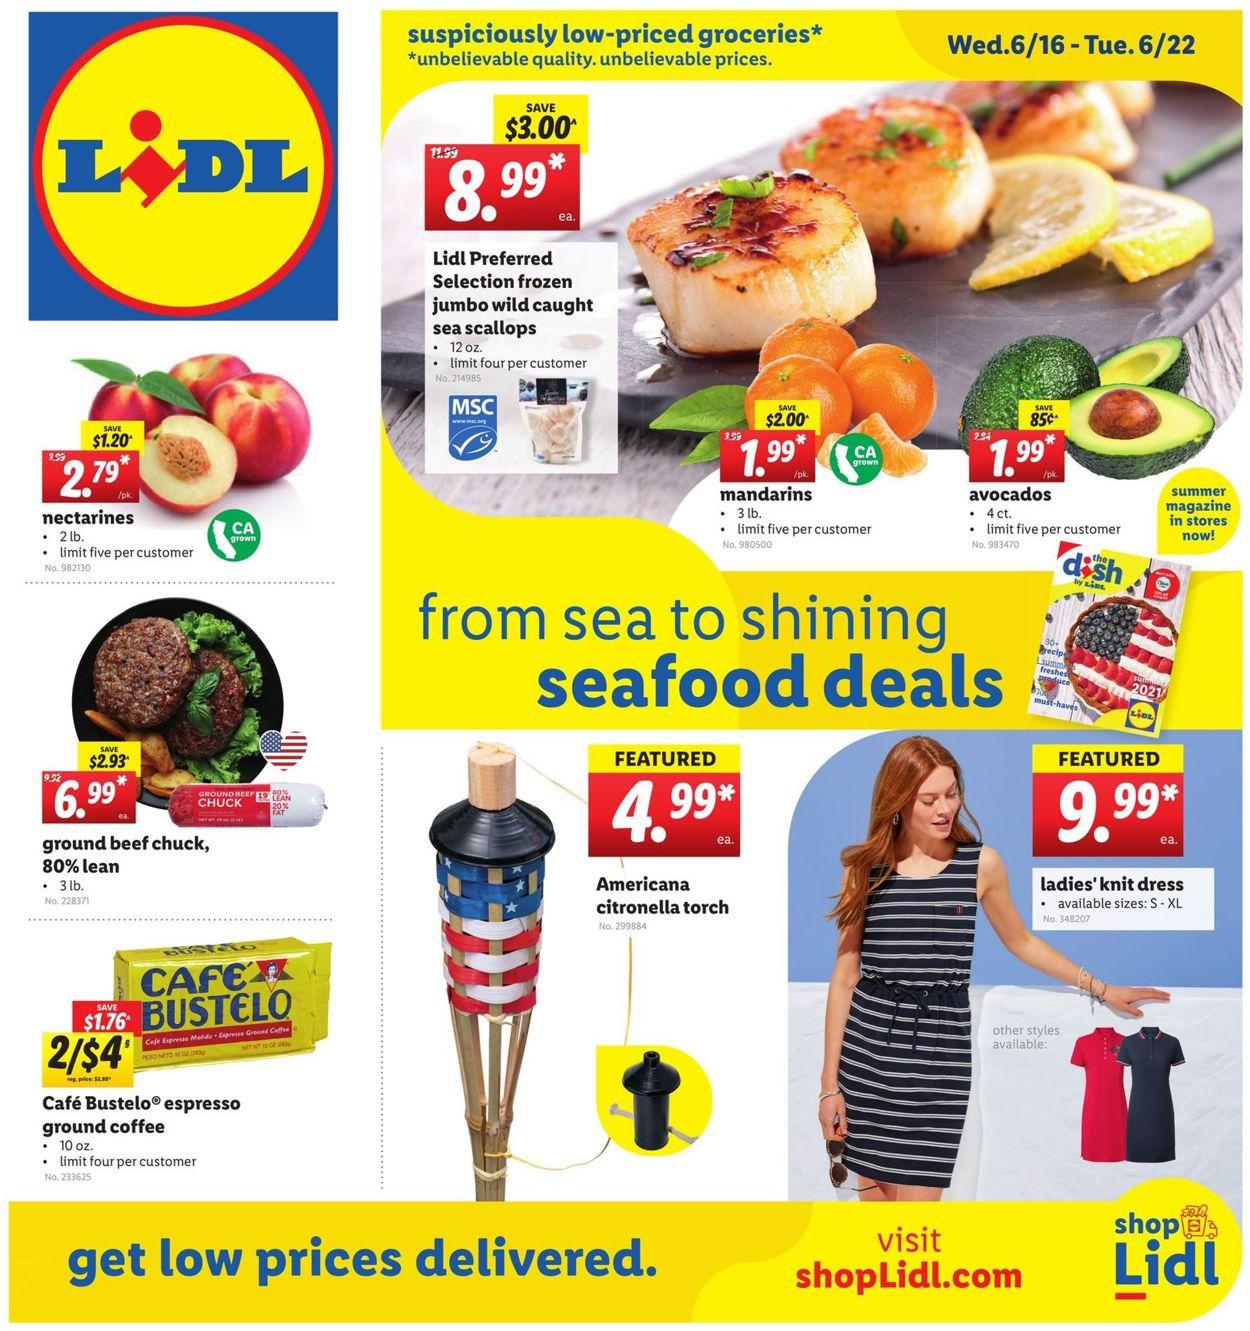 Lidl Weekly Ad Circular - valid 06/16-06/22/2021